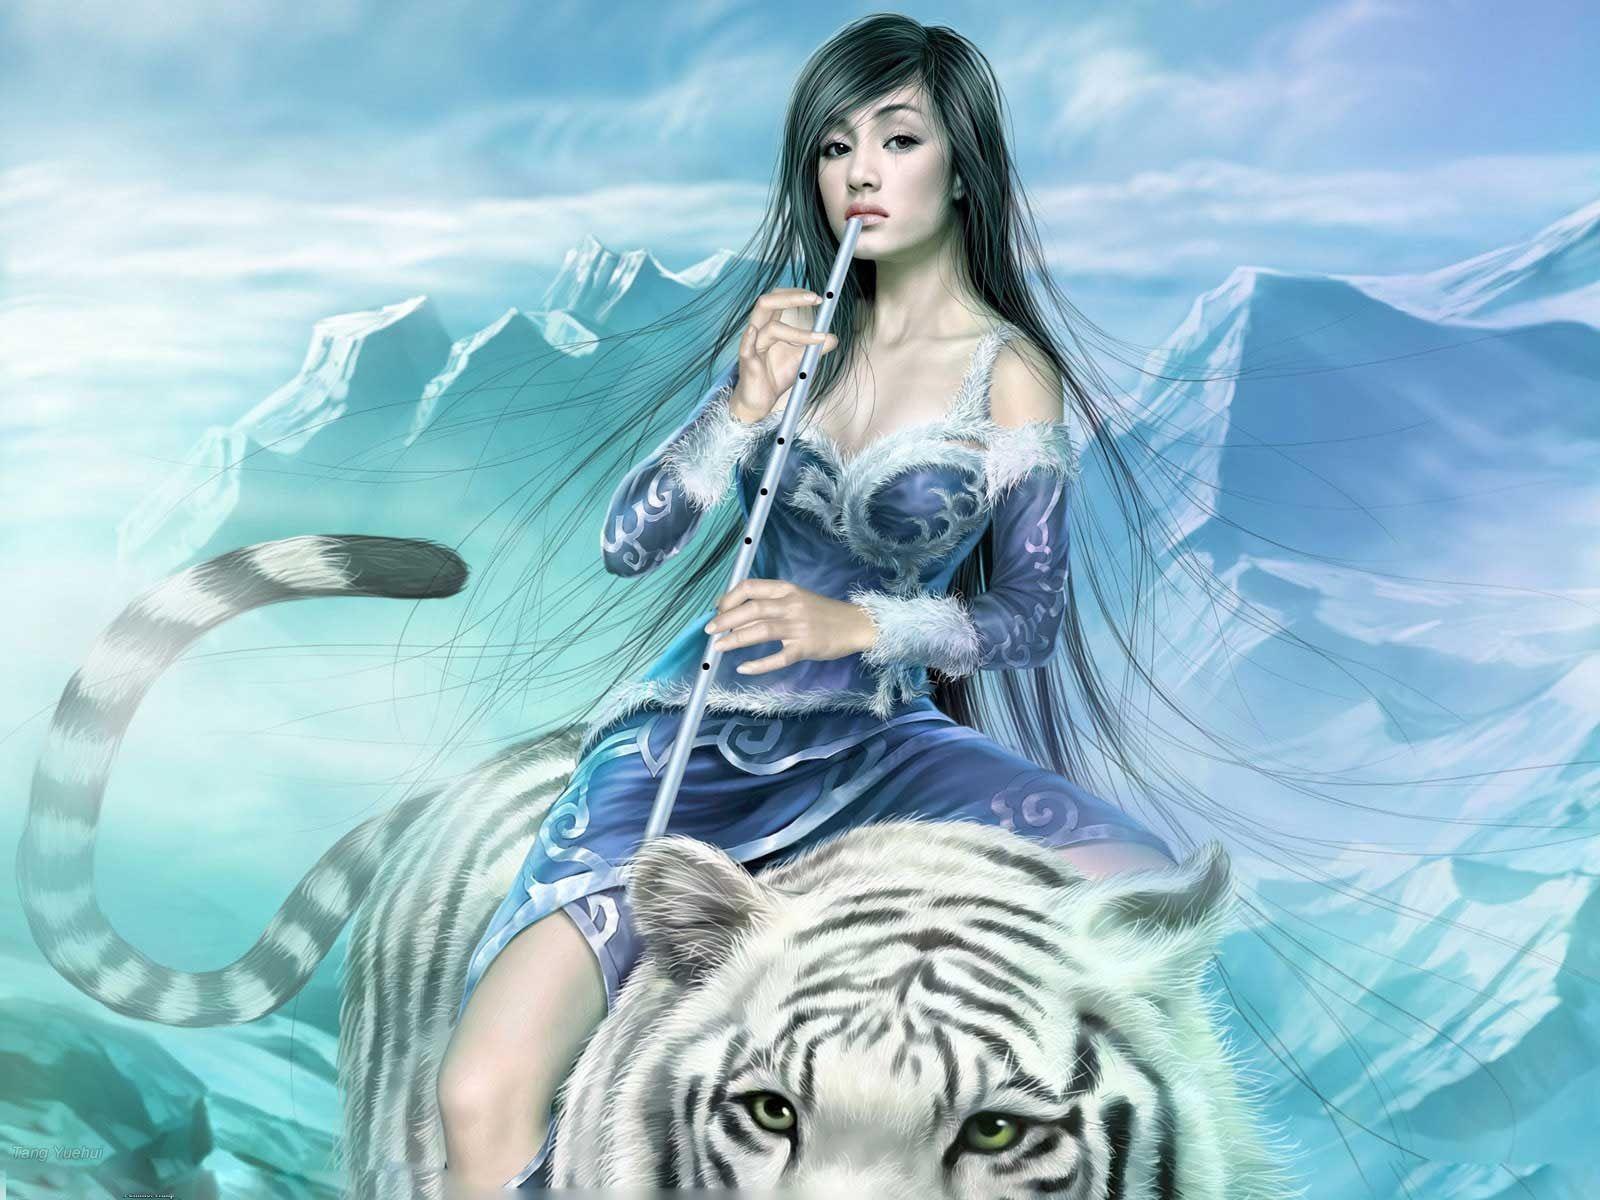 ball art girl fantasy tiger sphere HD wallpaper